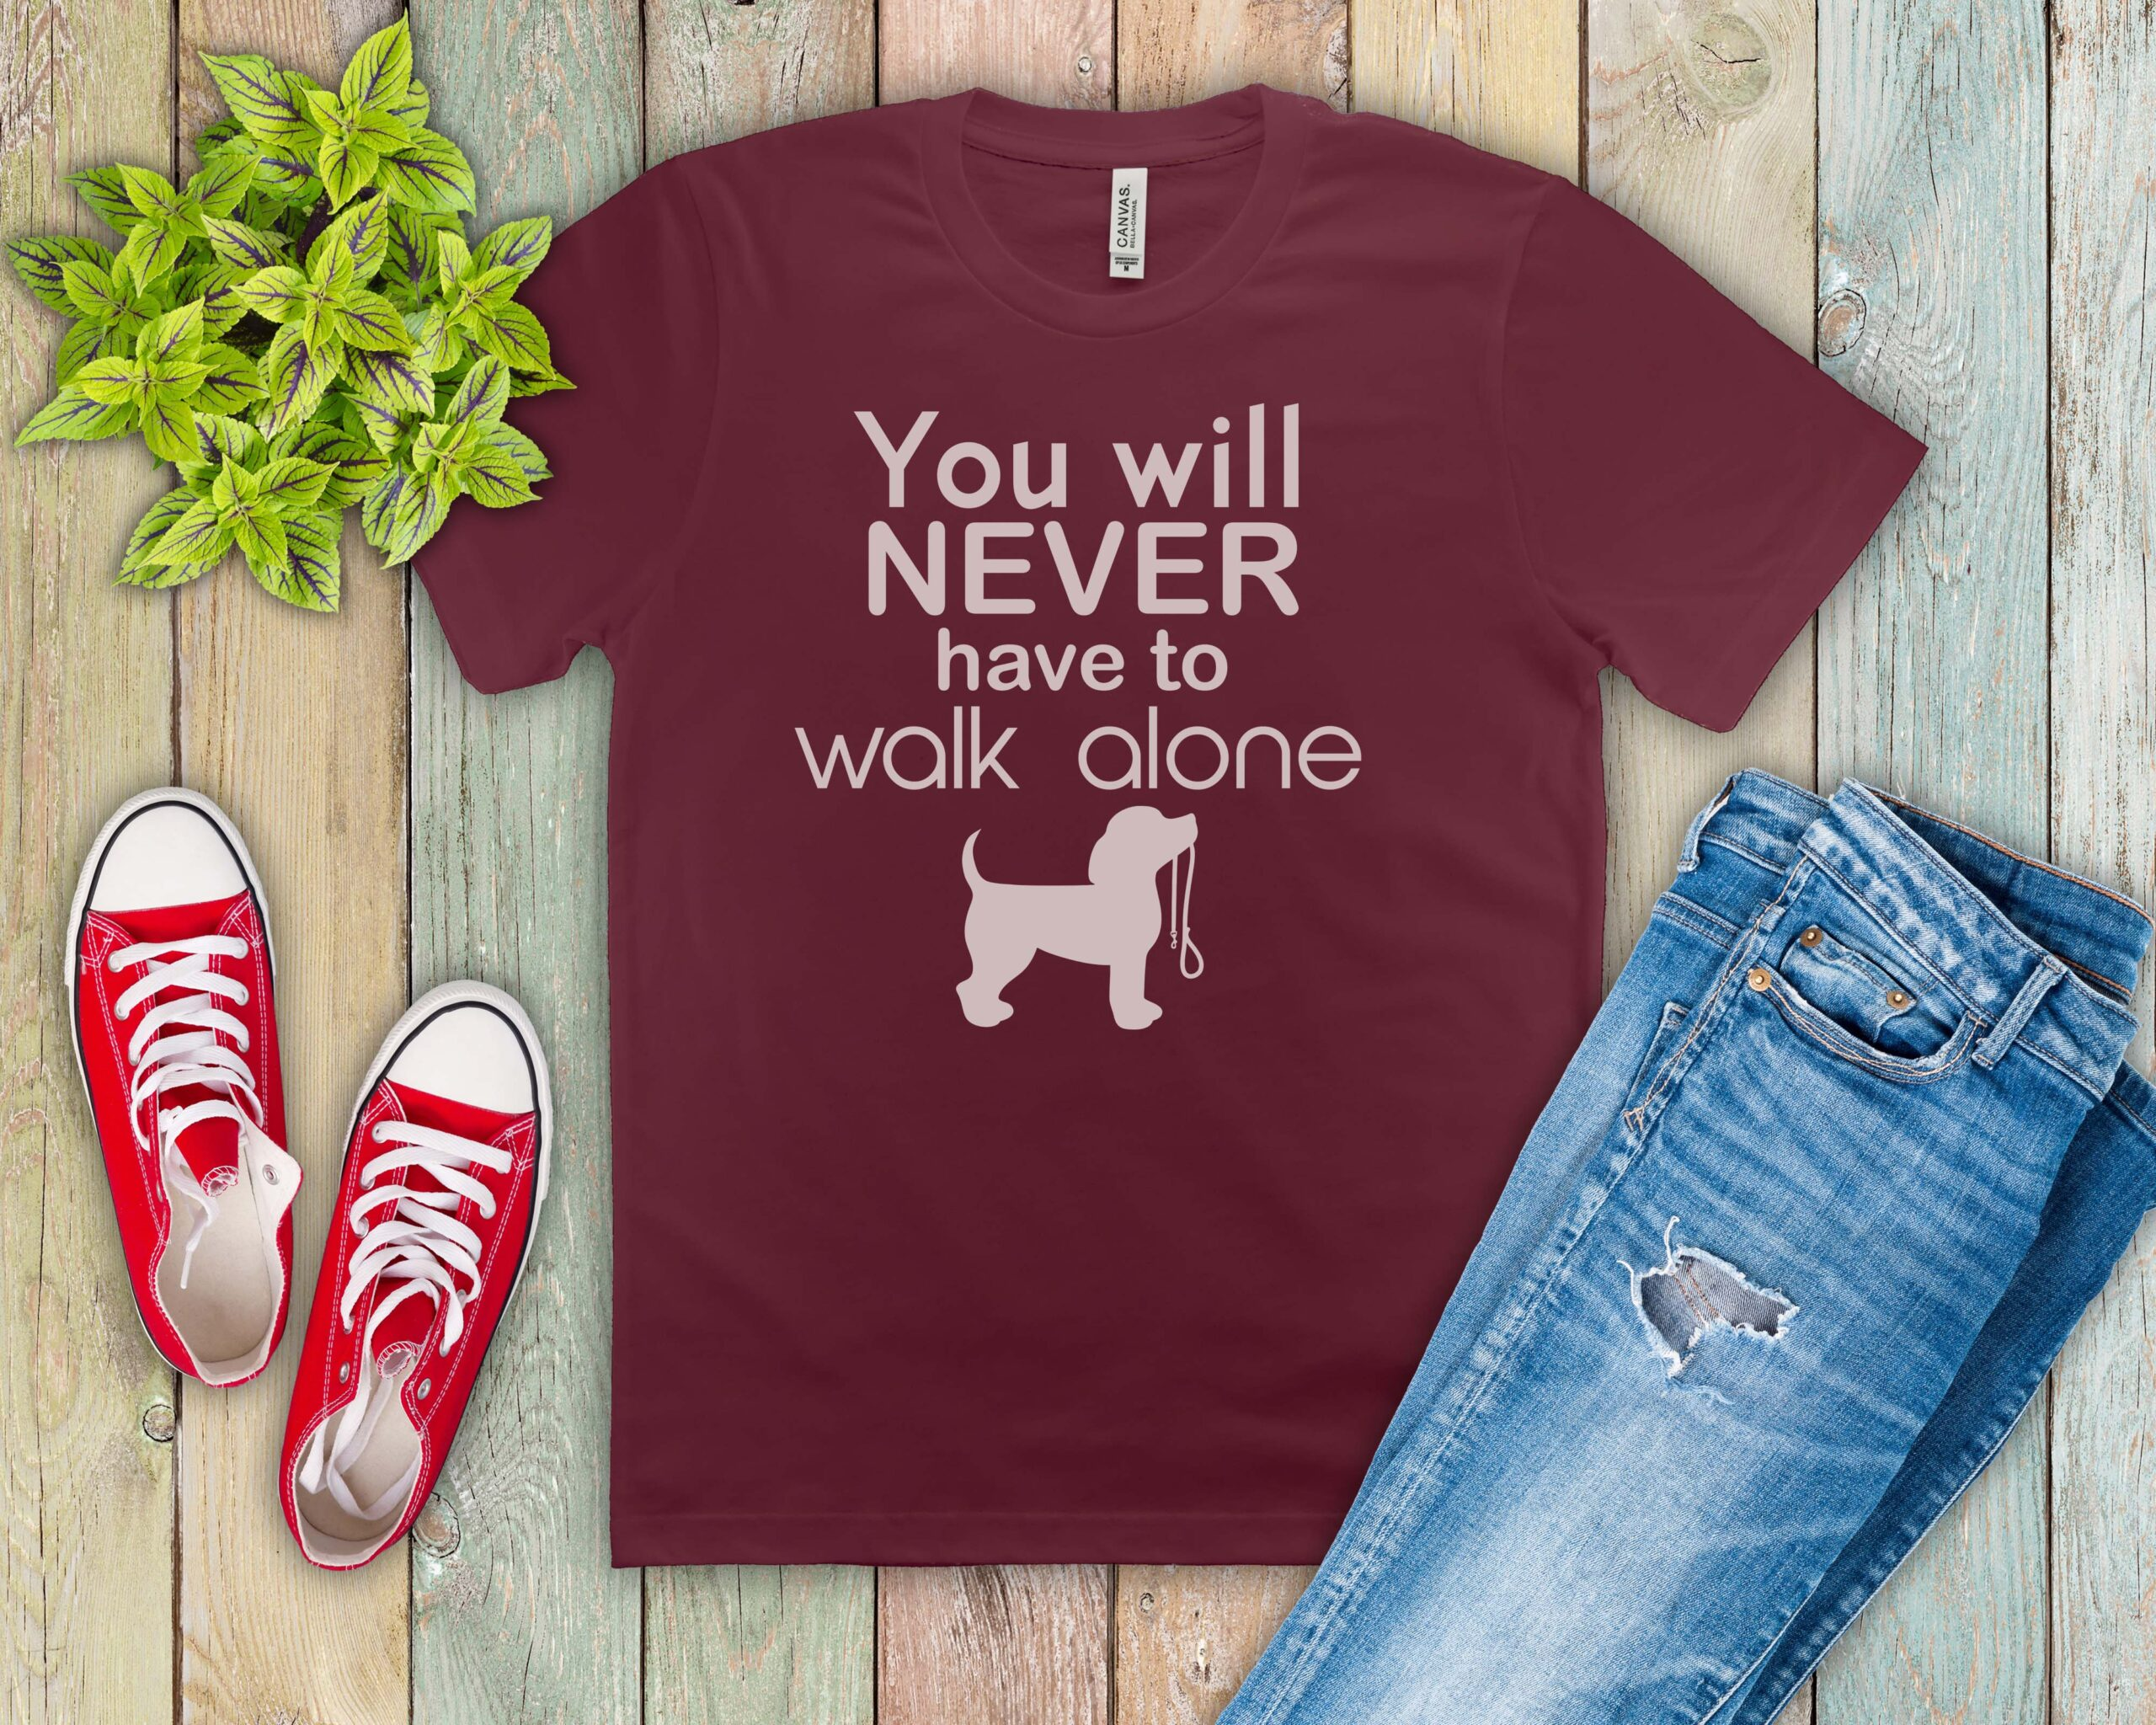 Free Never Walk Alone SVG File